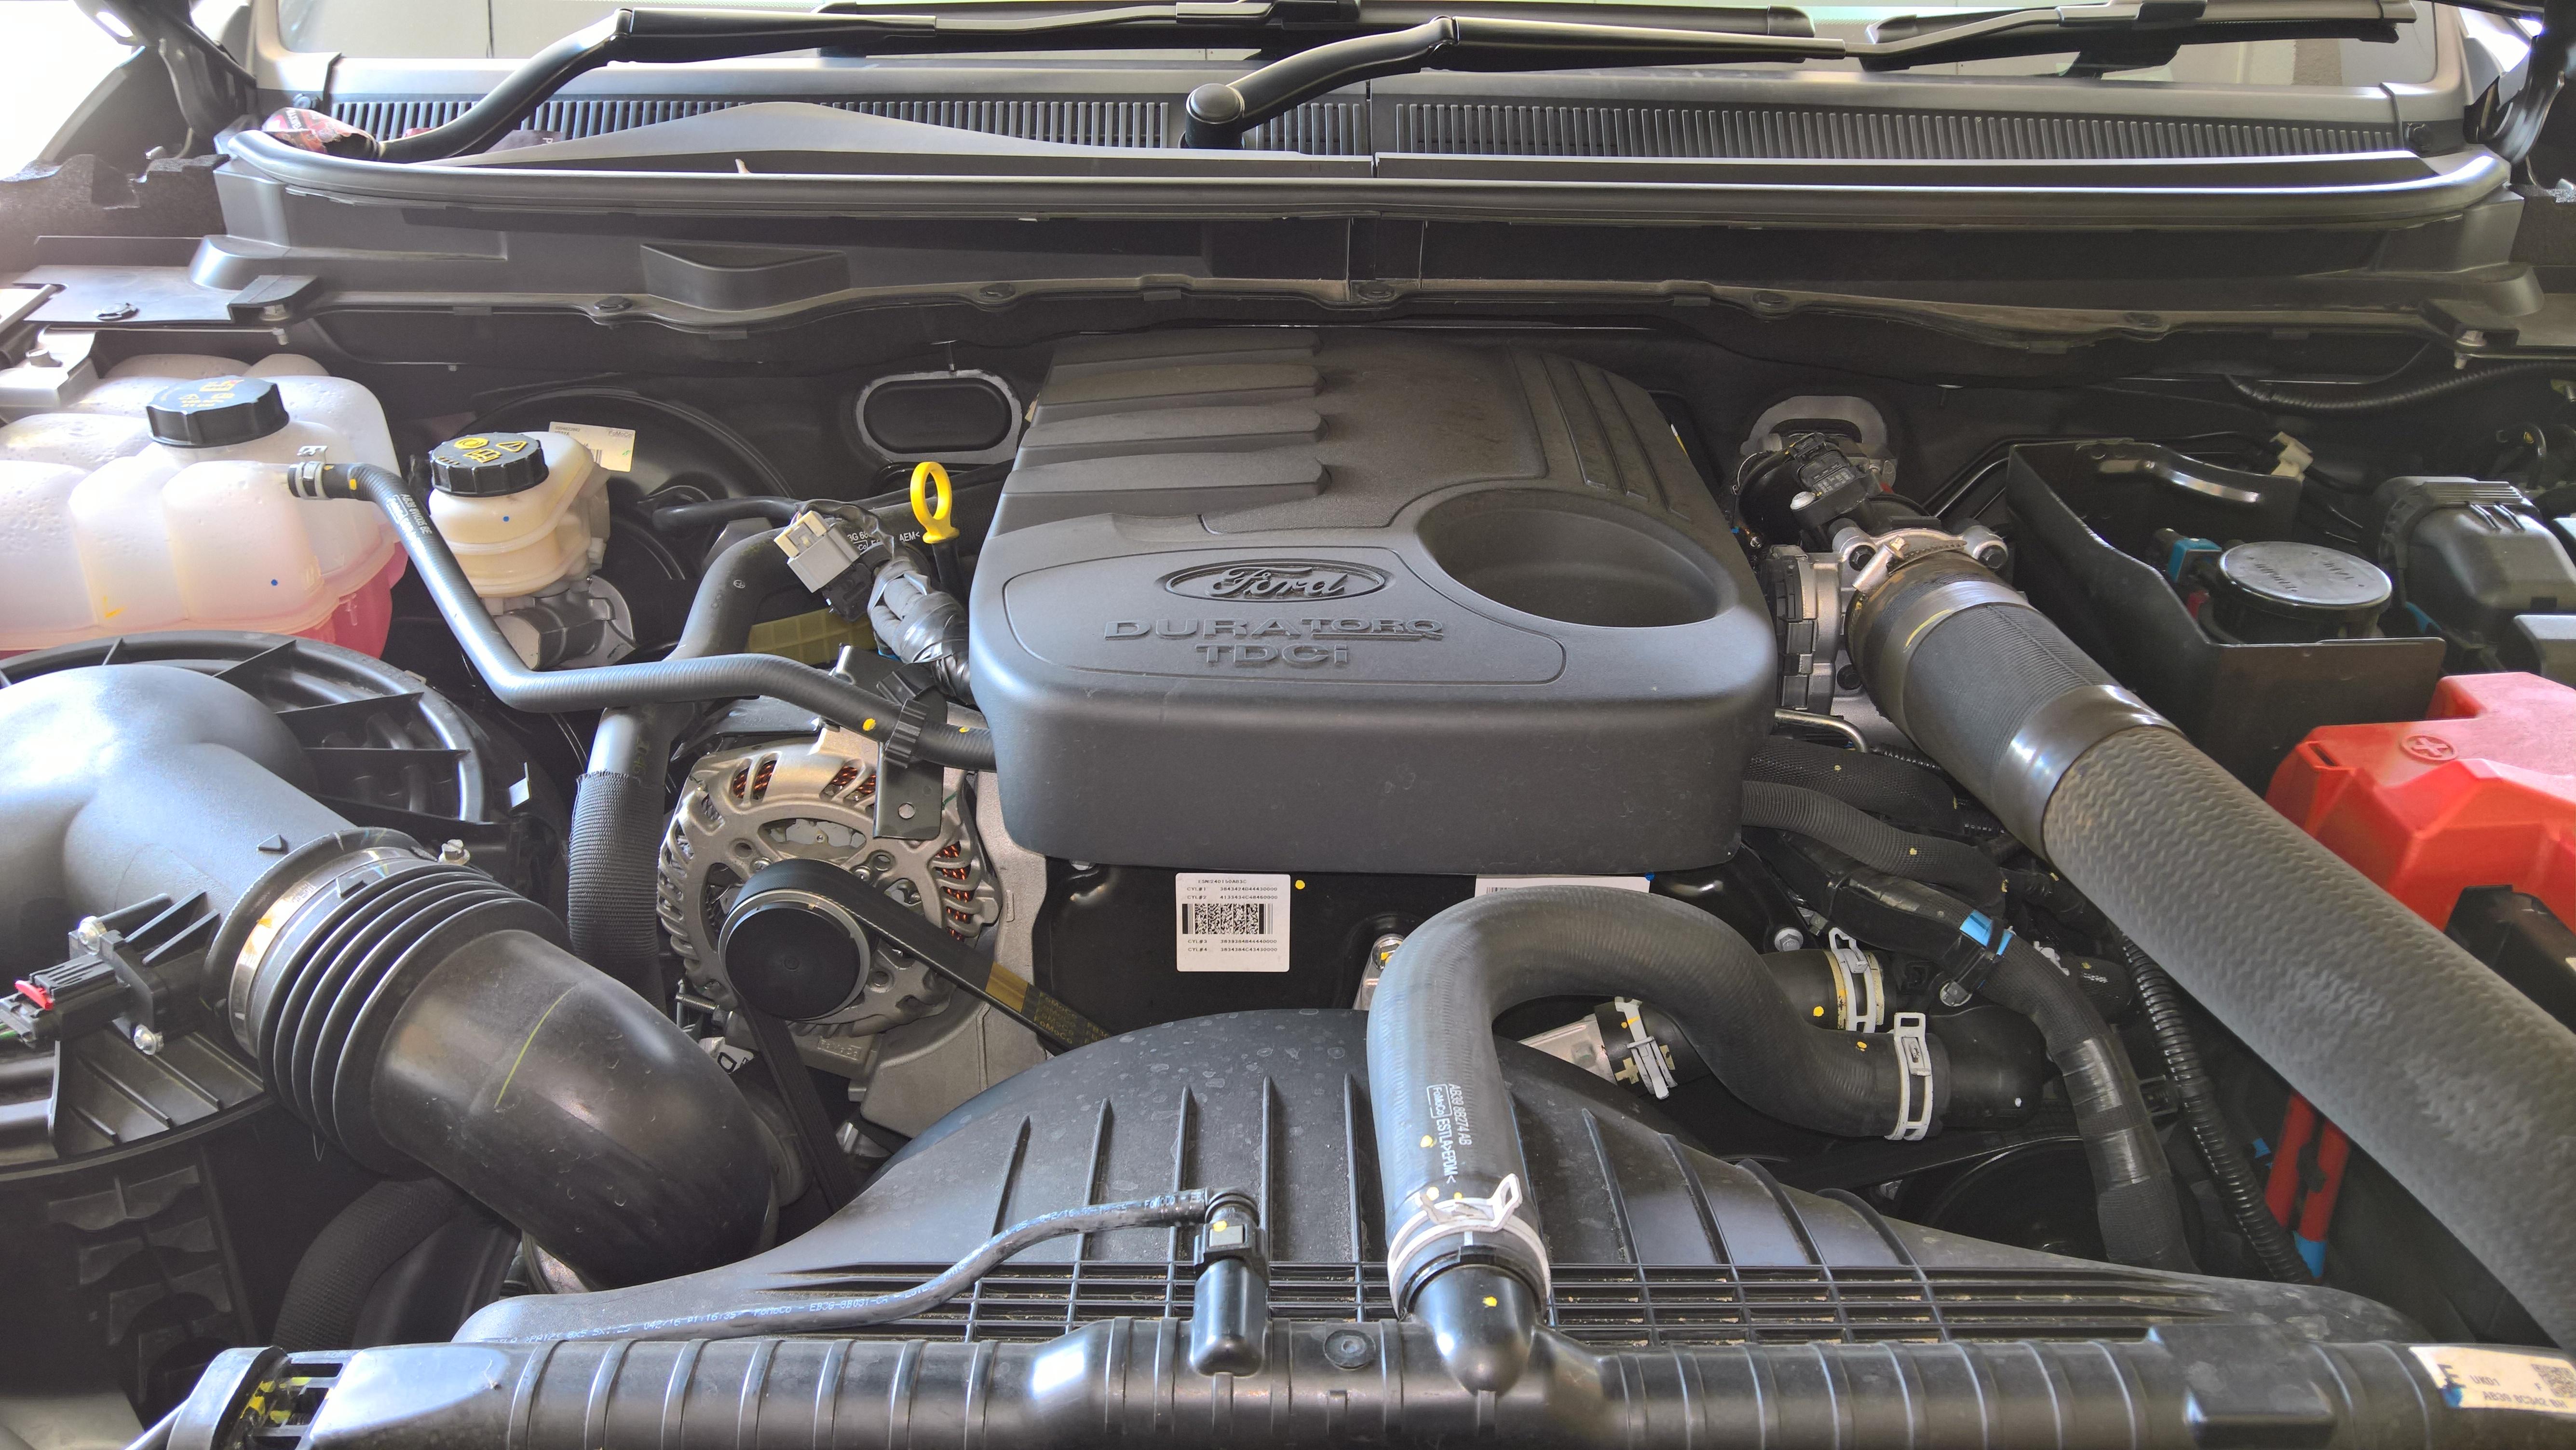 ford duratorq engine wikipedia    ford cars